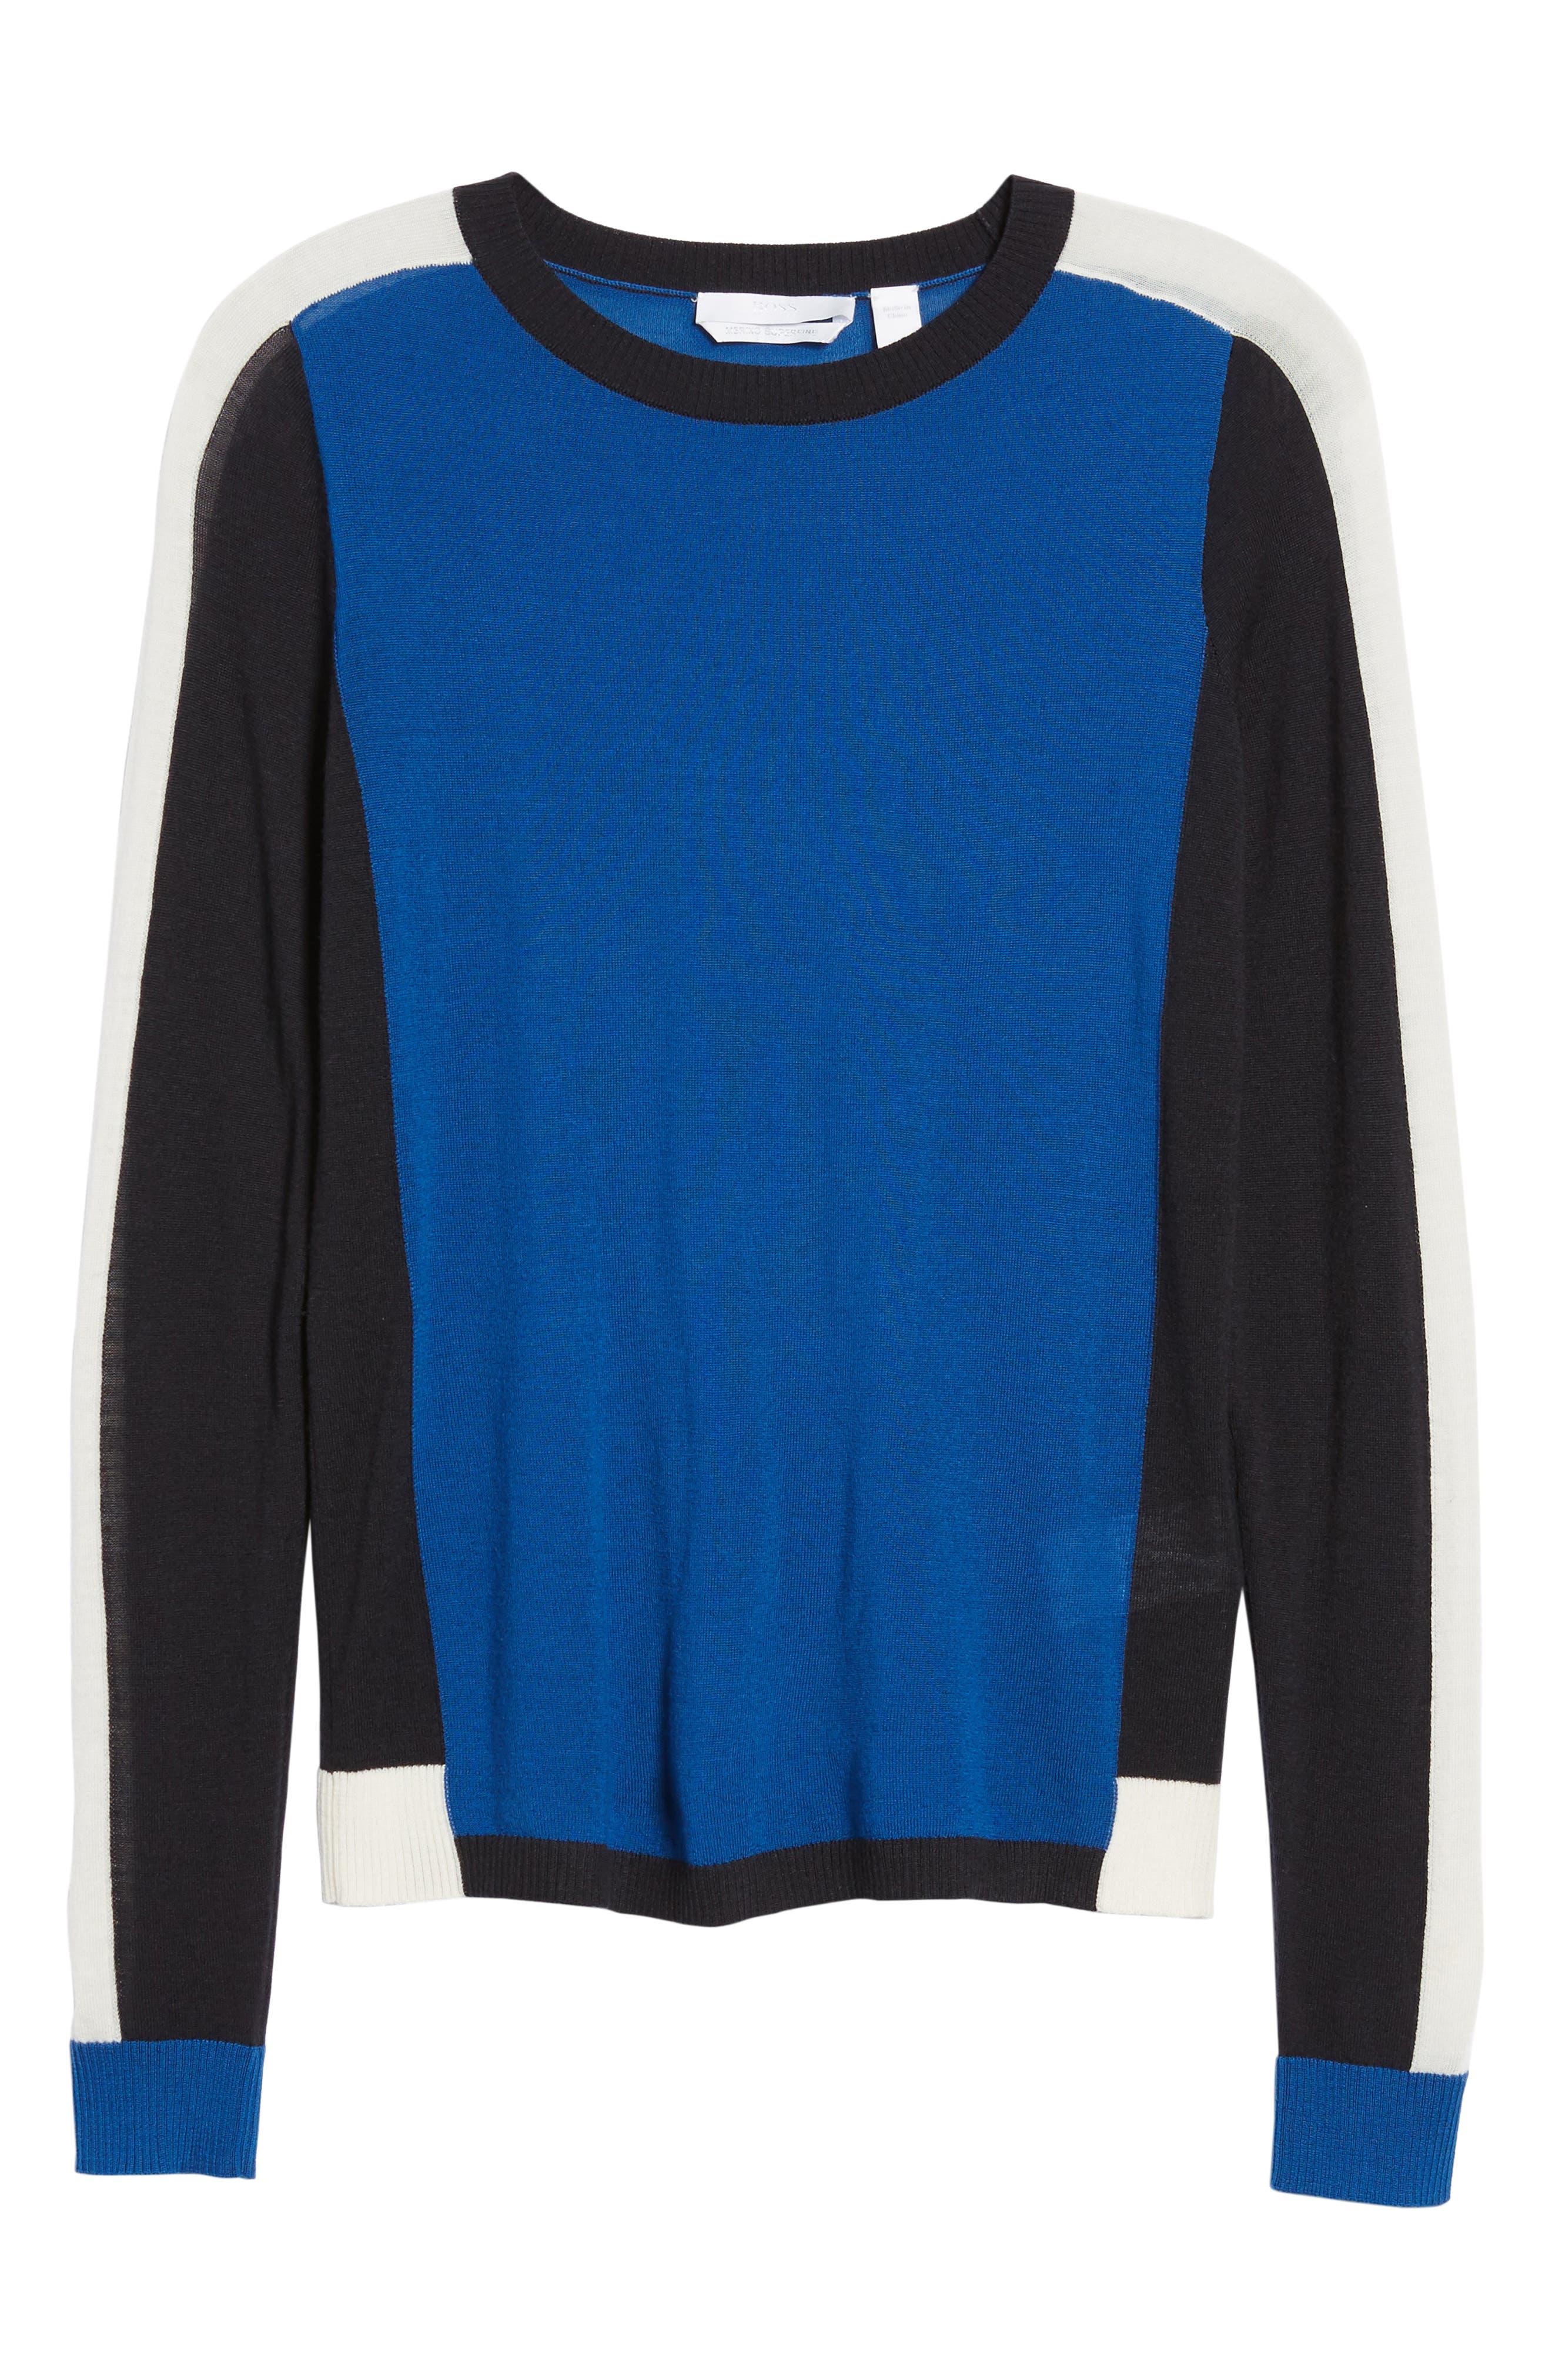 Ferda Colorblock Wool Sweater,                             Alternate thumbnail 6, color,                             471